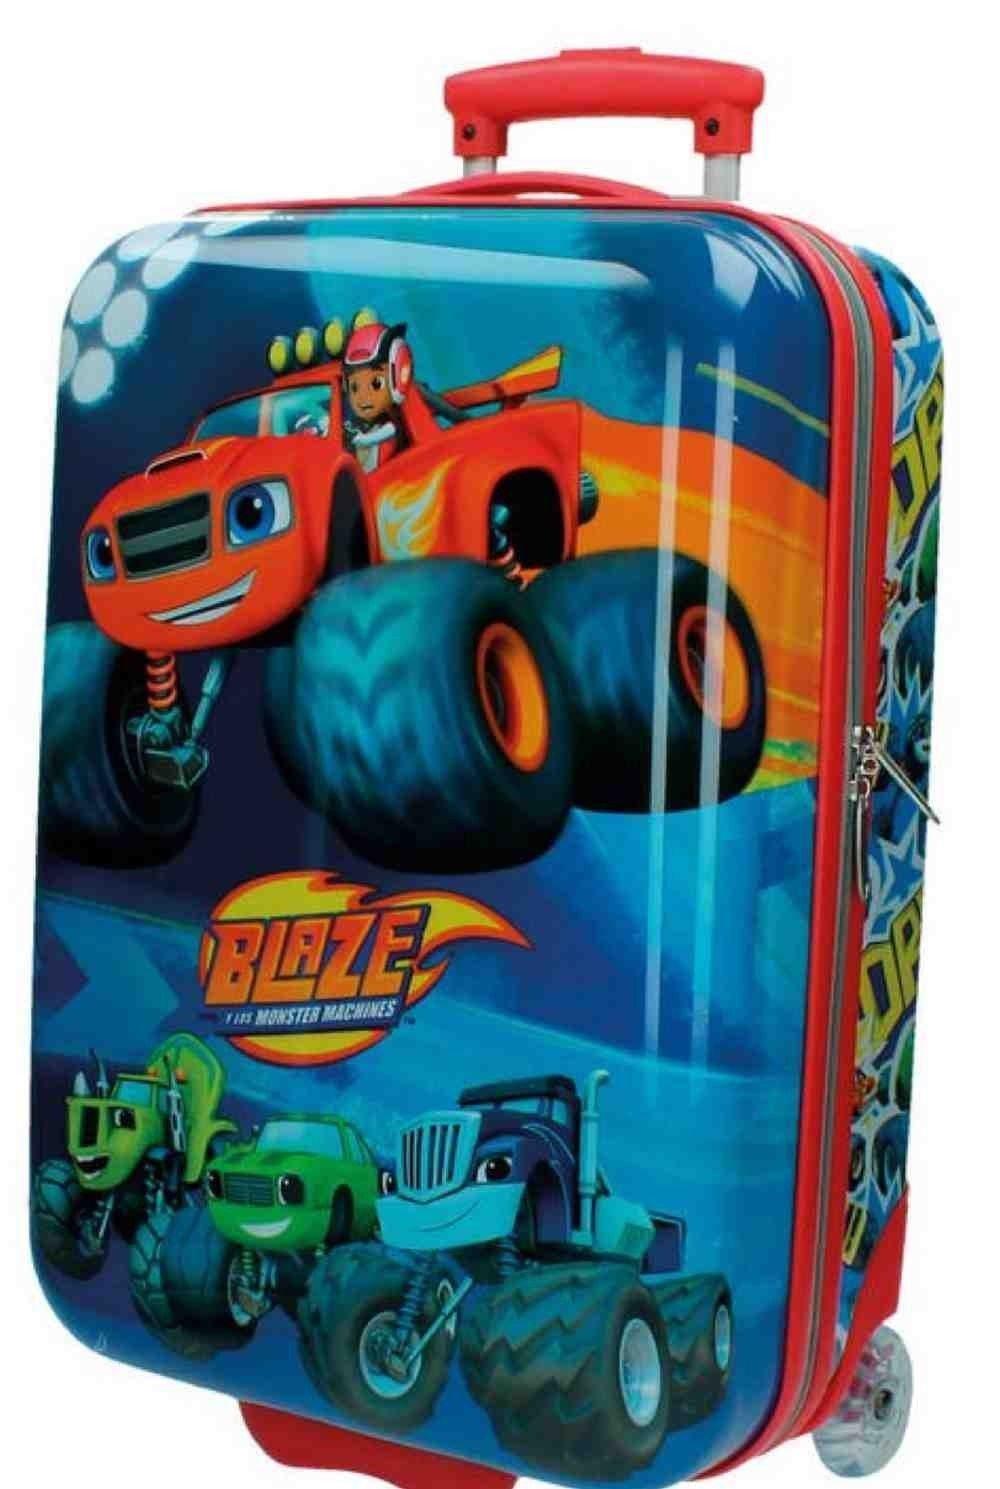 Blaze Kabinenkoffer Maschinen Kindergepäck, 34 Liter, Rot